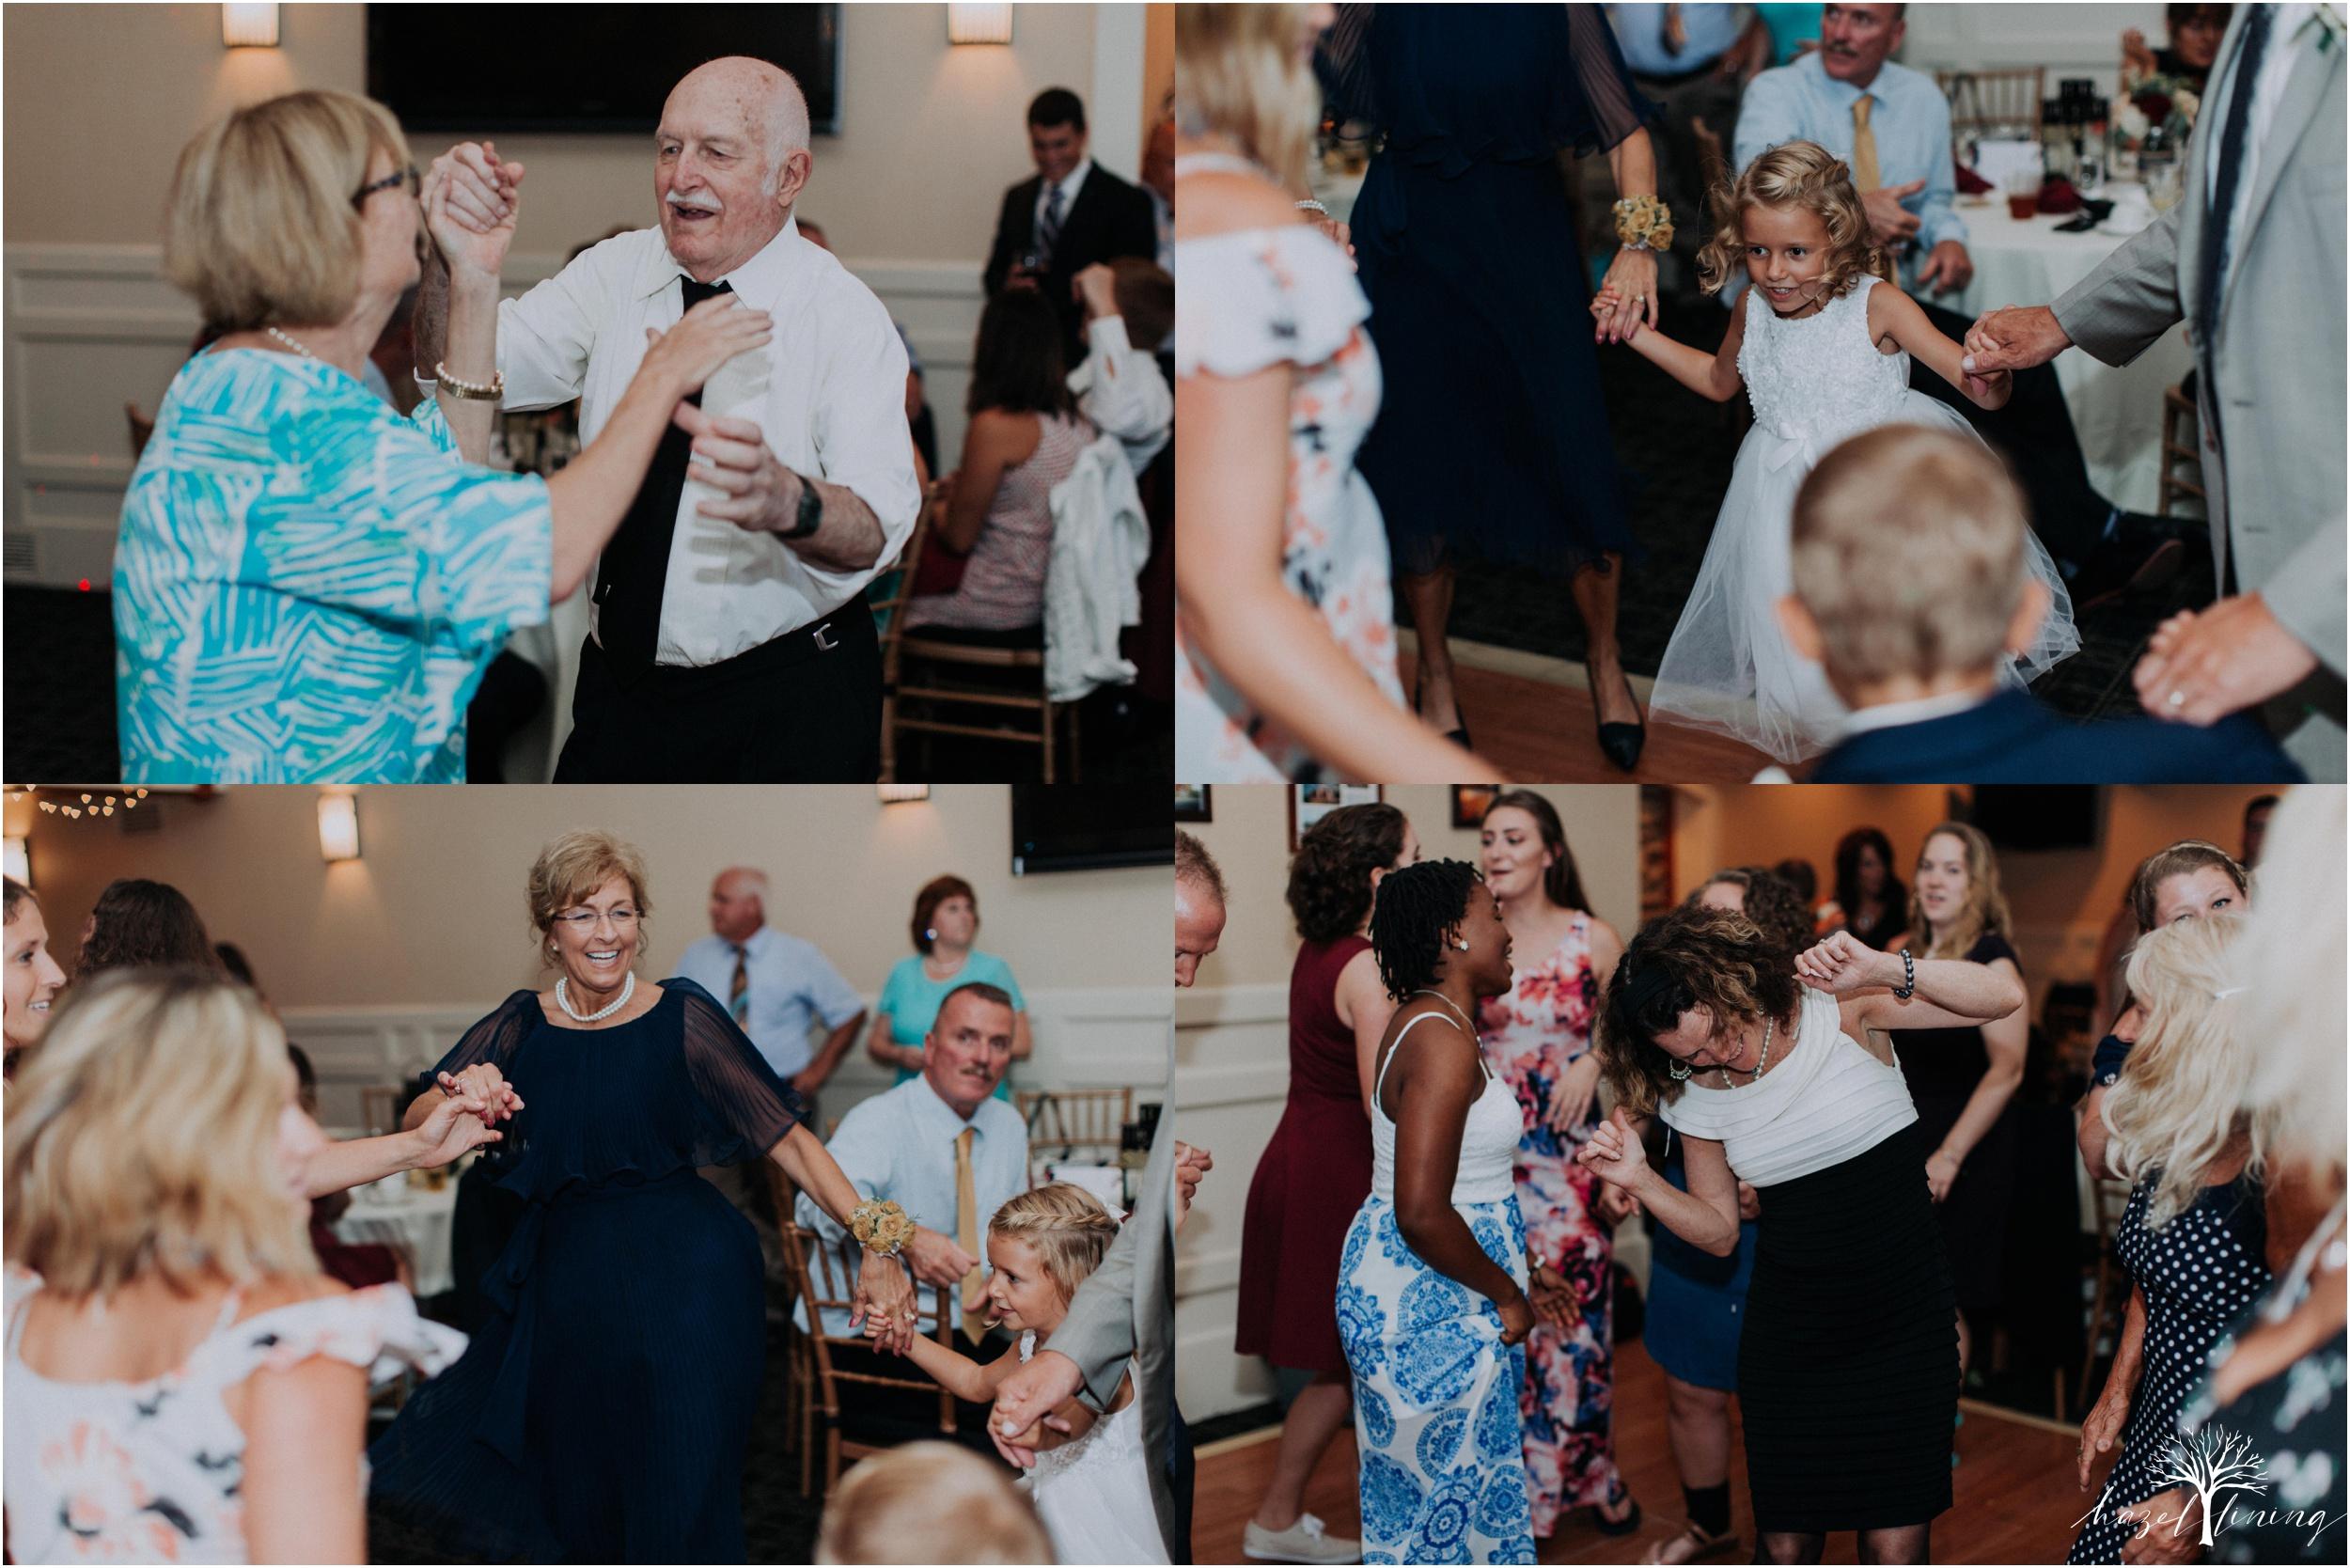 jonathan-weibel-becky-haywood-loft-at-sweetwater-cc-pennsburg-pennsylvania-rainy-day-summer-wedding-hazel-lining-travel-wedding-elopement-photography_0123.jpg